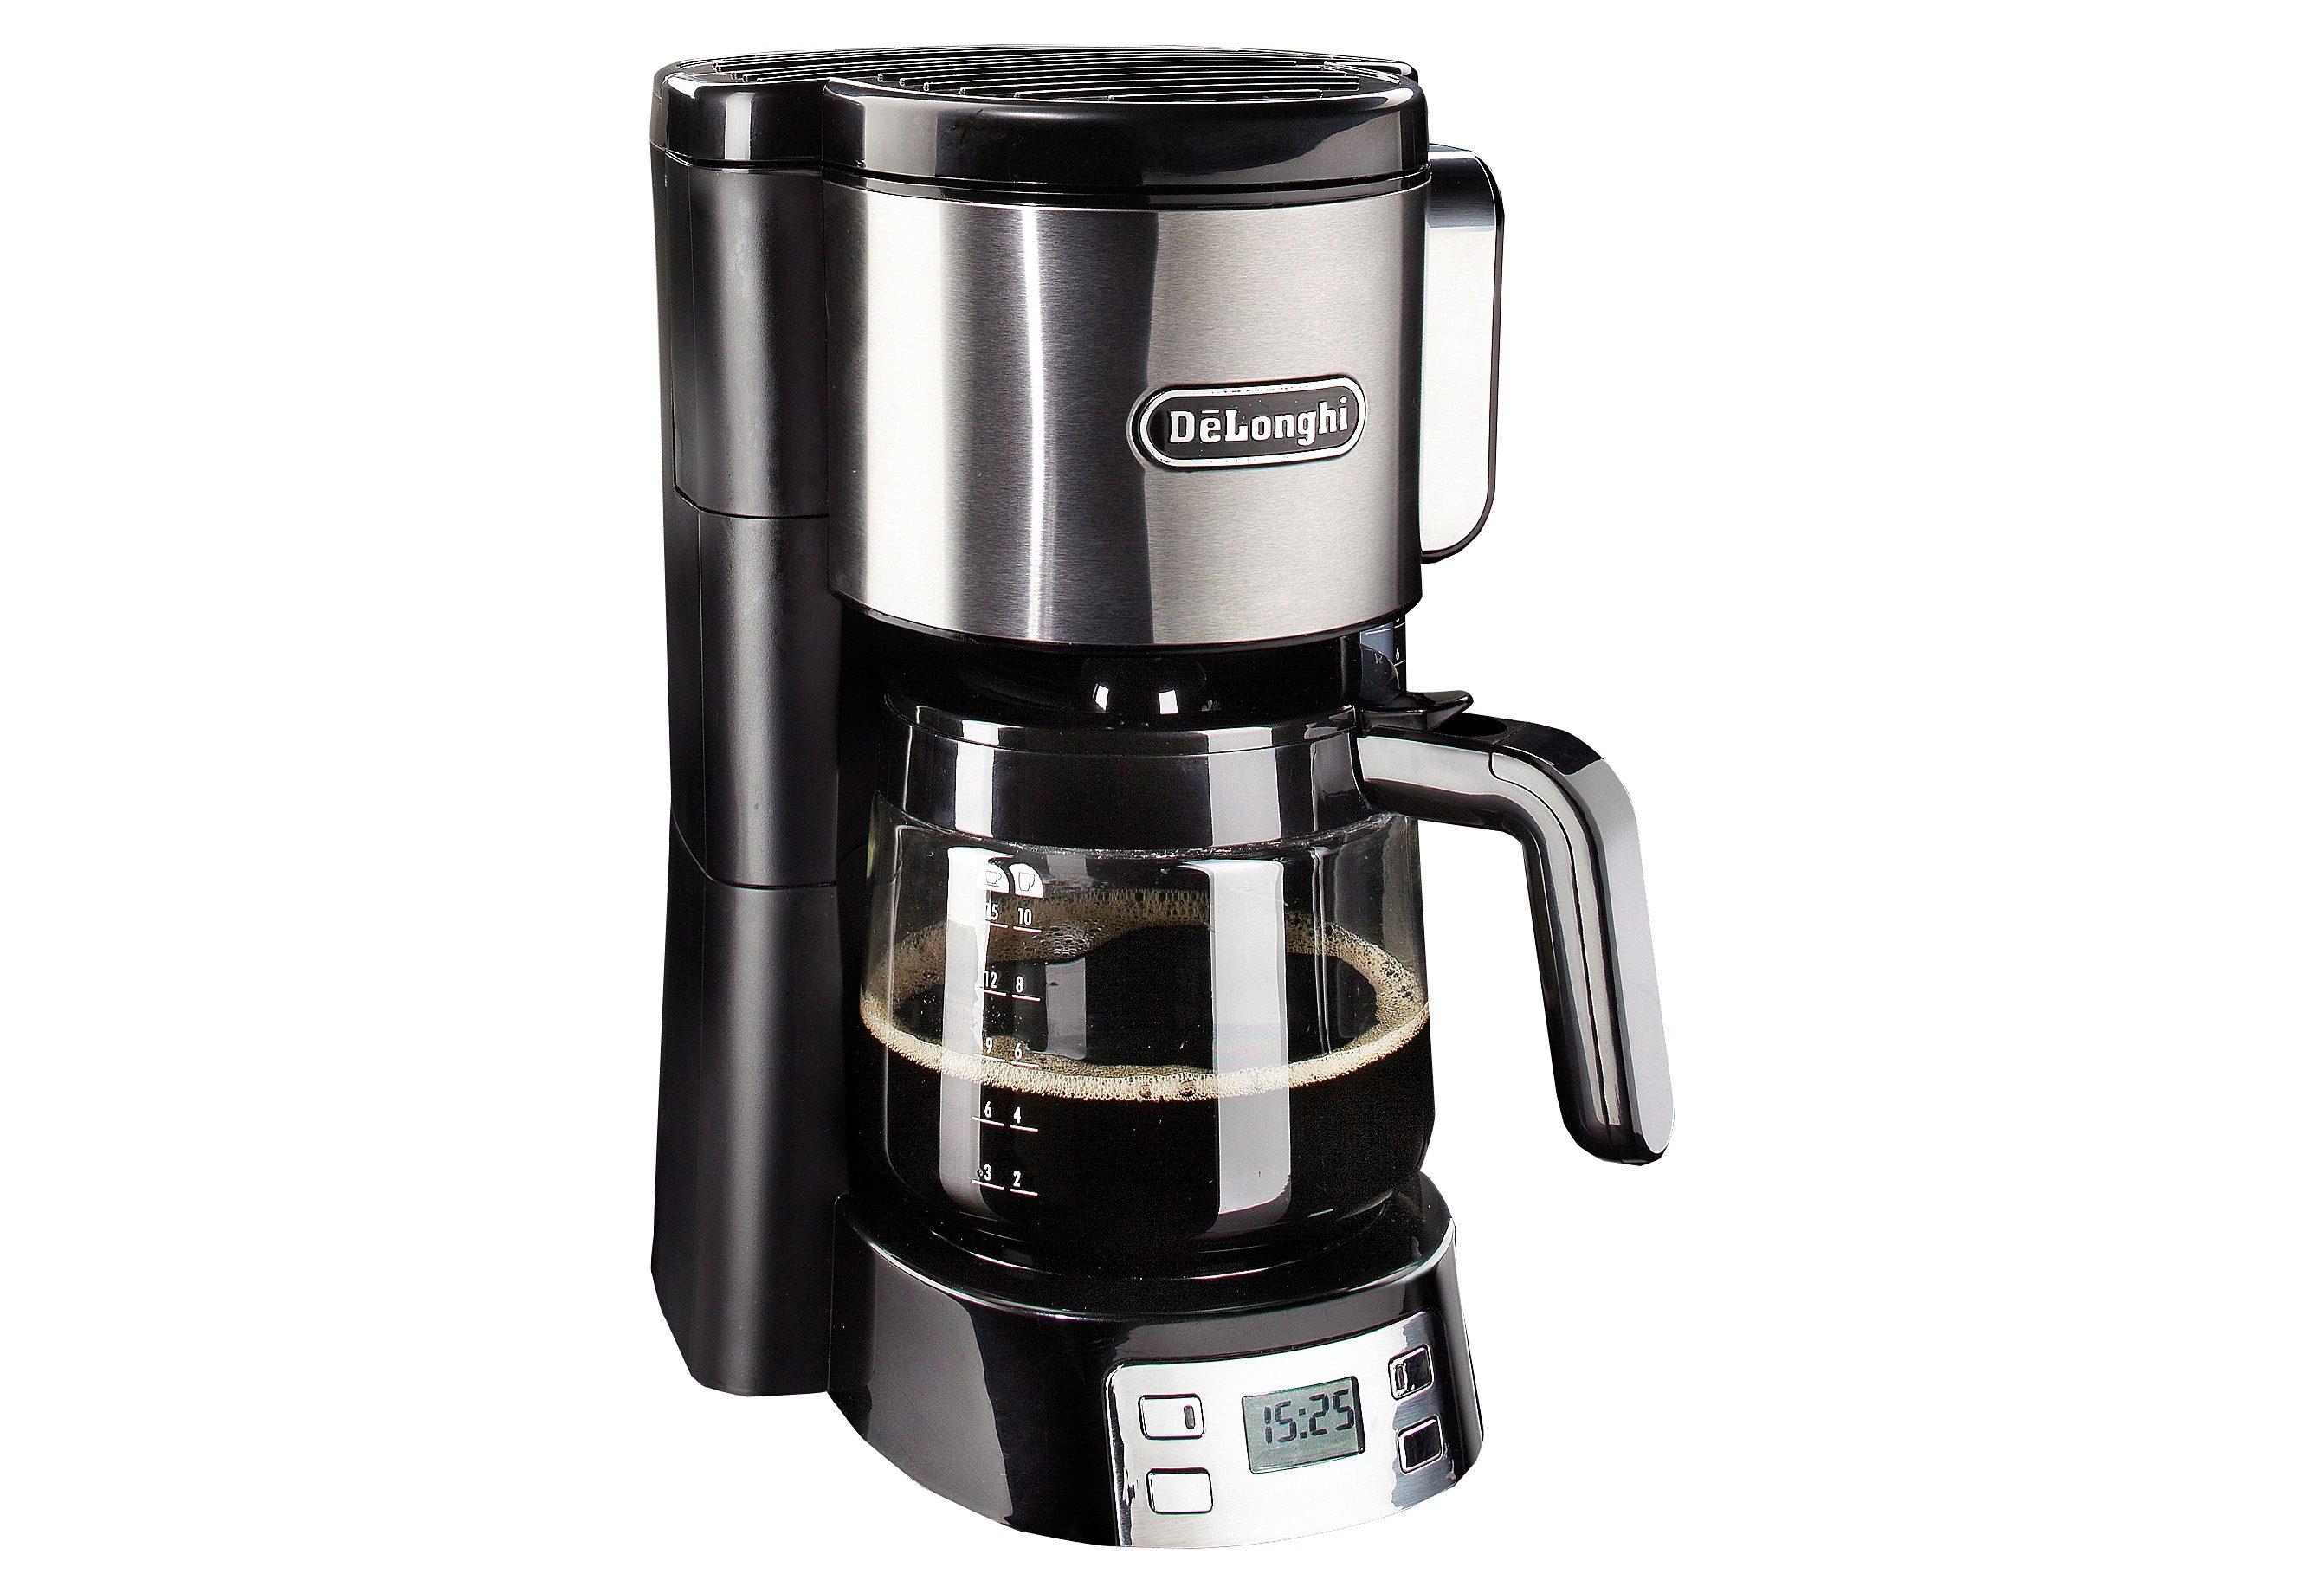 De'Longhi Filterkaffeemaschine ICM 15250, 1,25l Kaffeekanne, Papierfilter 1x4, komplett frontal bedienbar